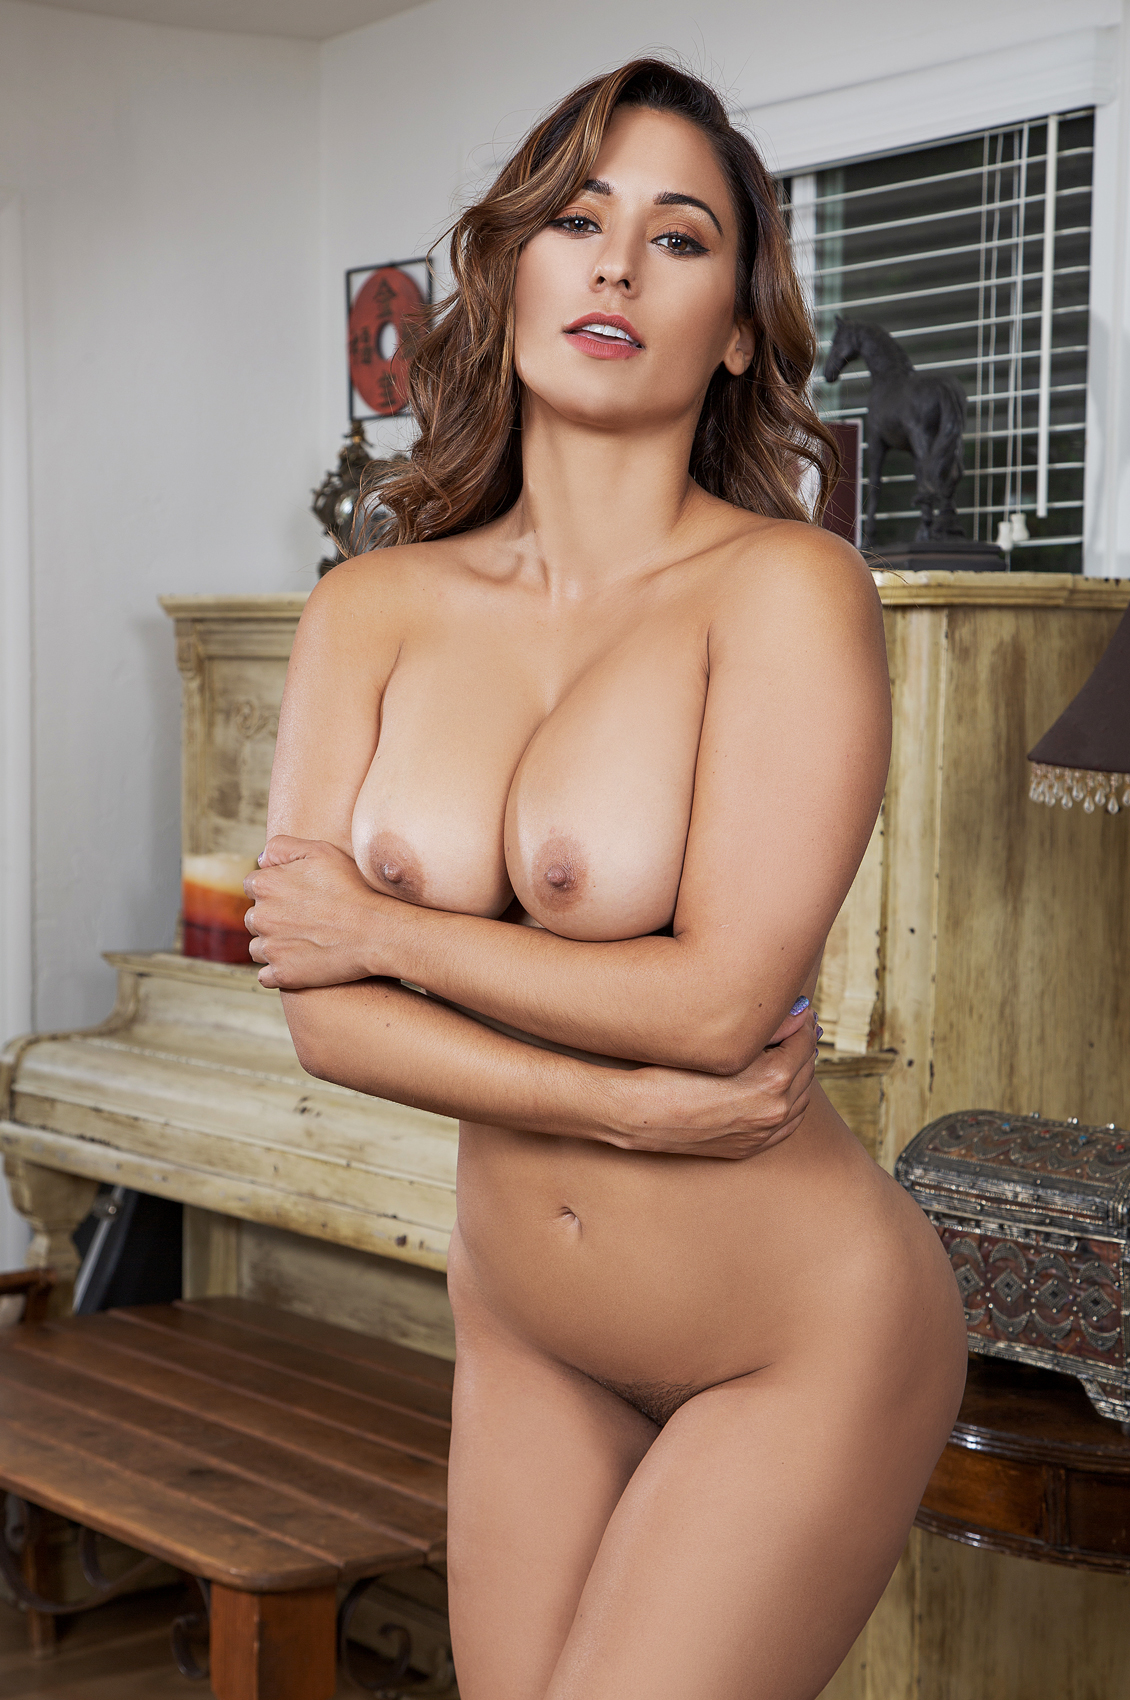 Reena Sky's VR Porn Videos, Bio & Free Nude Pics